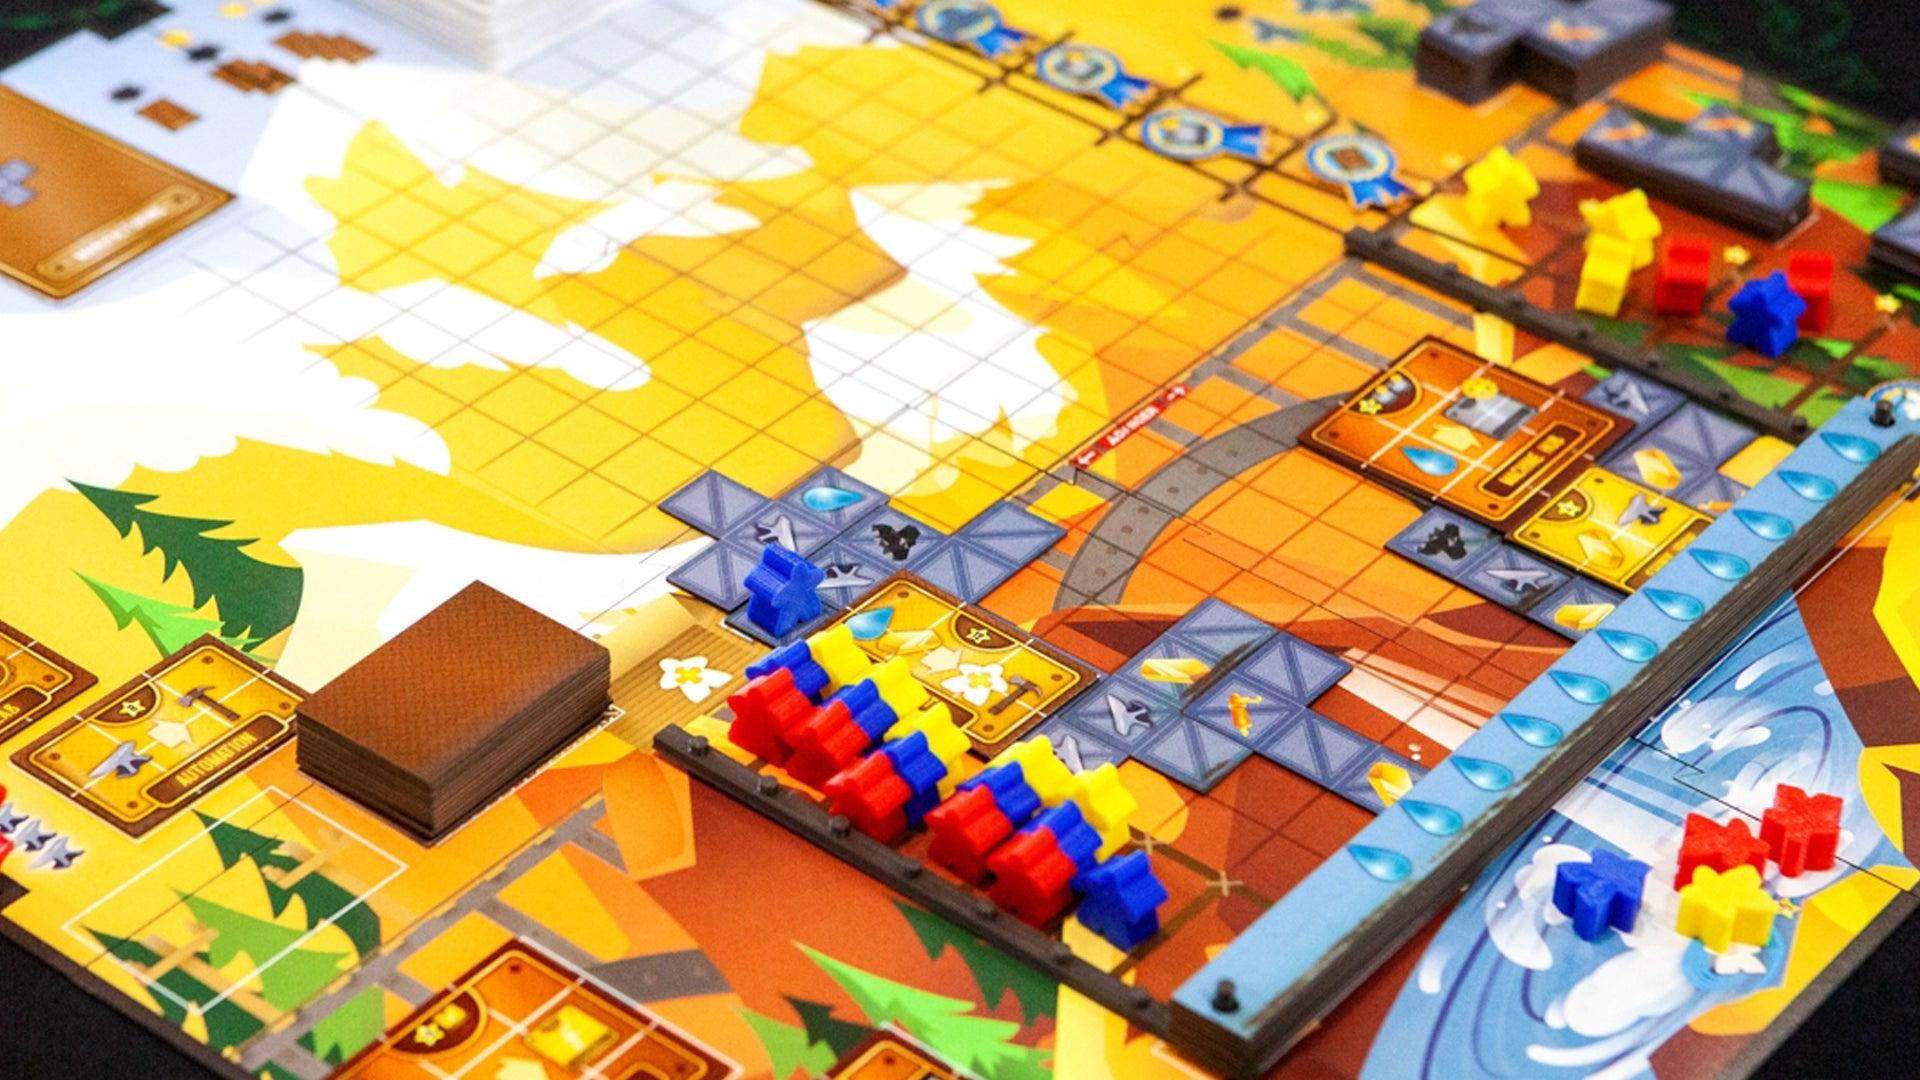 whistle-mountain-board-game-prototype-gameplay.jpeg